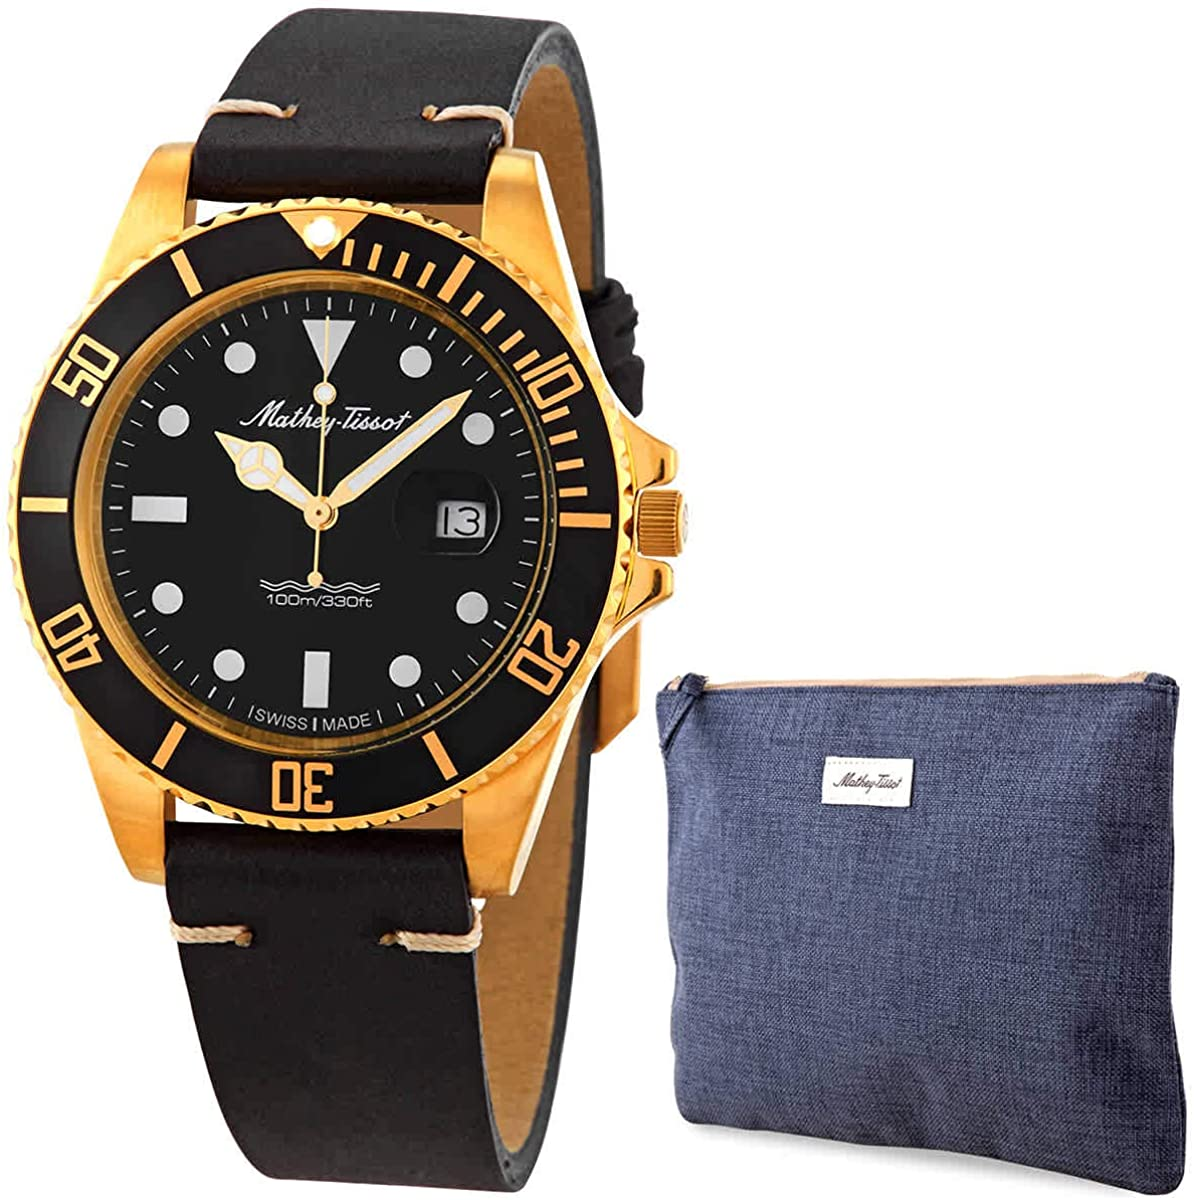 Mathey-Tissot Mathey Vintage Quartz Black Dial Men's Watch H9010PLN